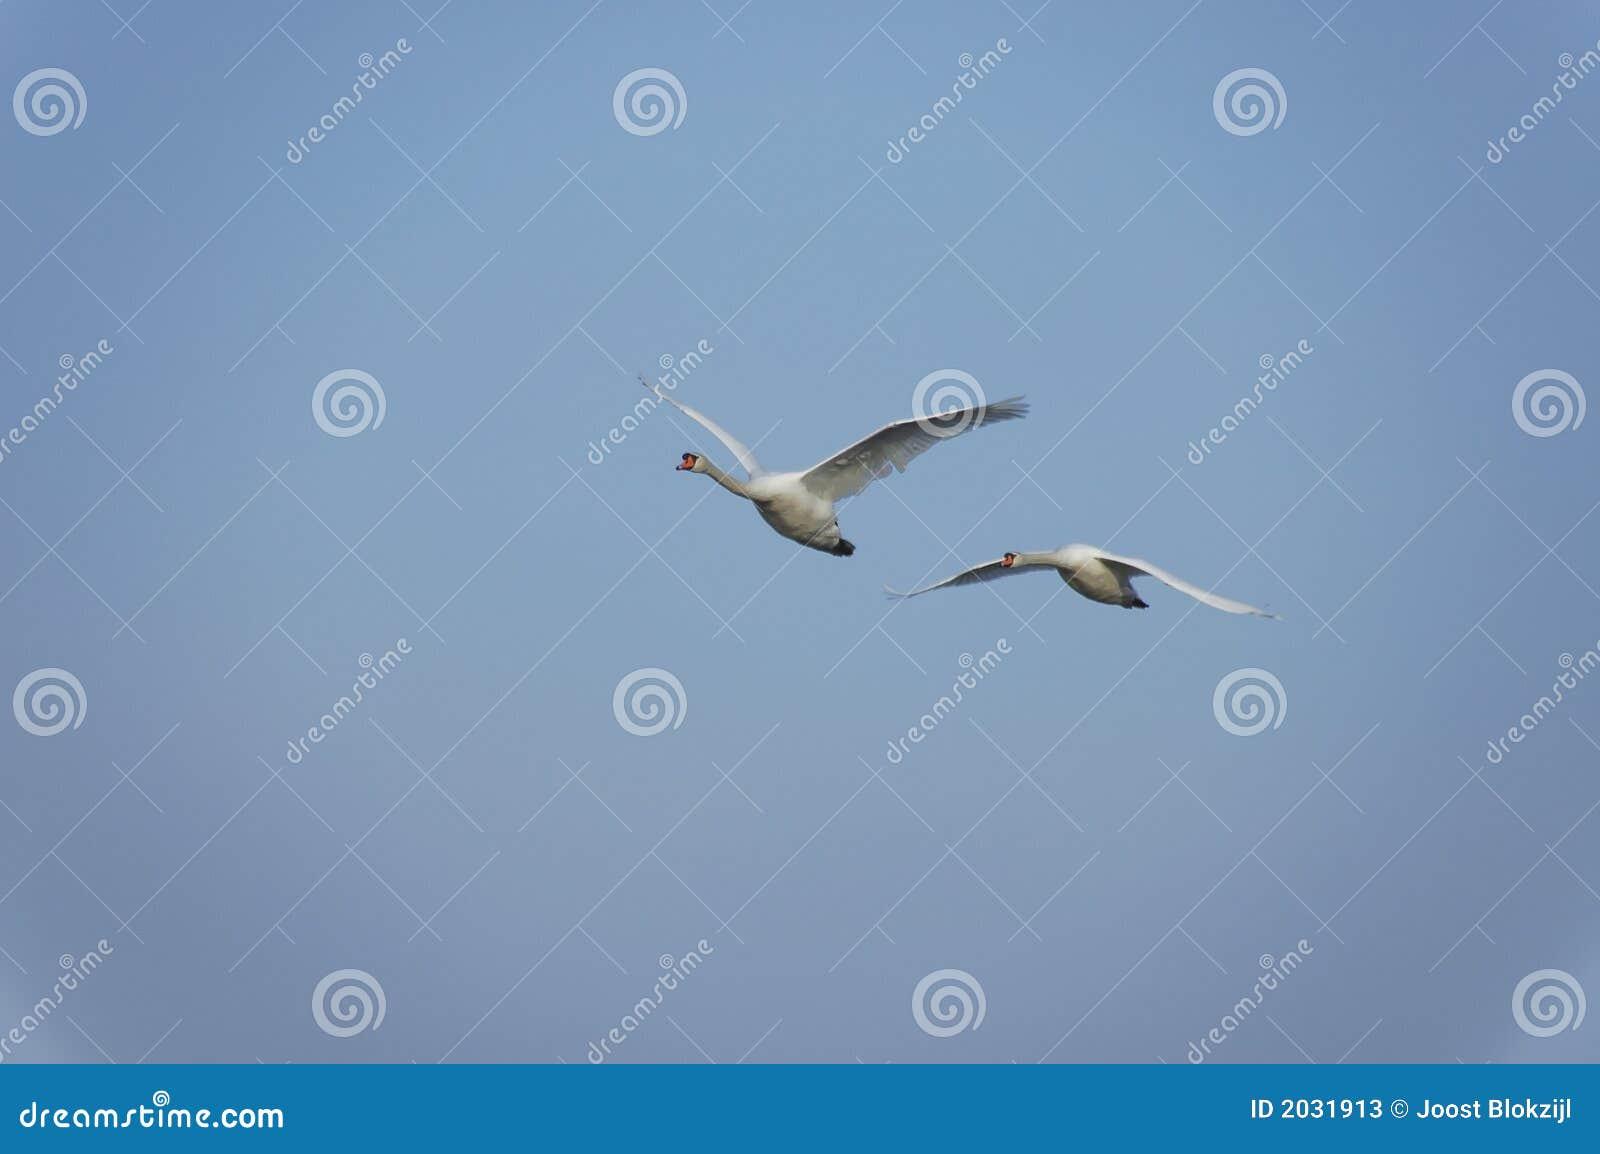 Flying swans